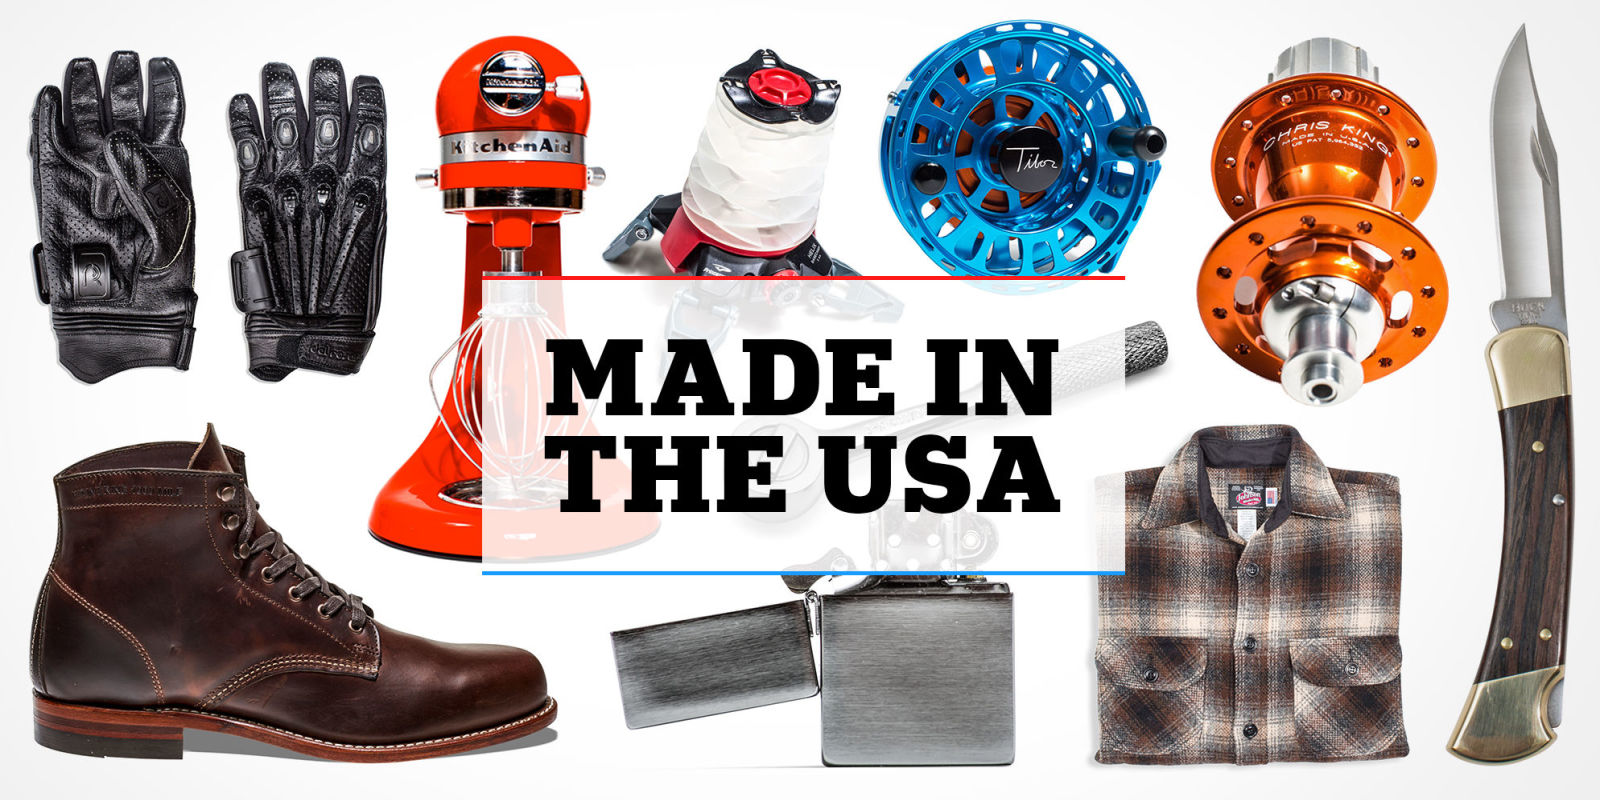 usa america tools built